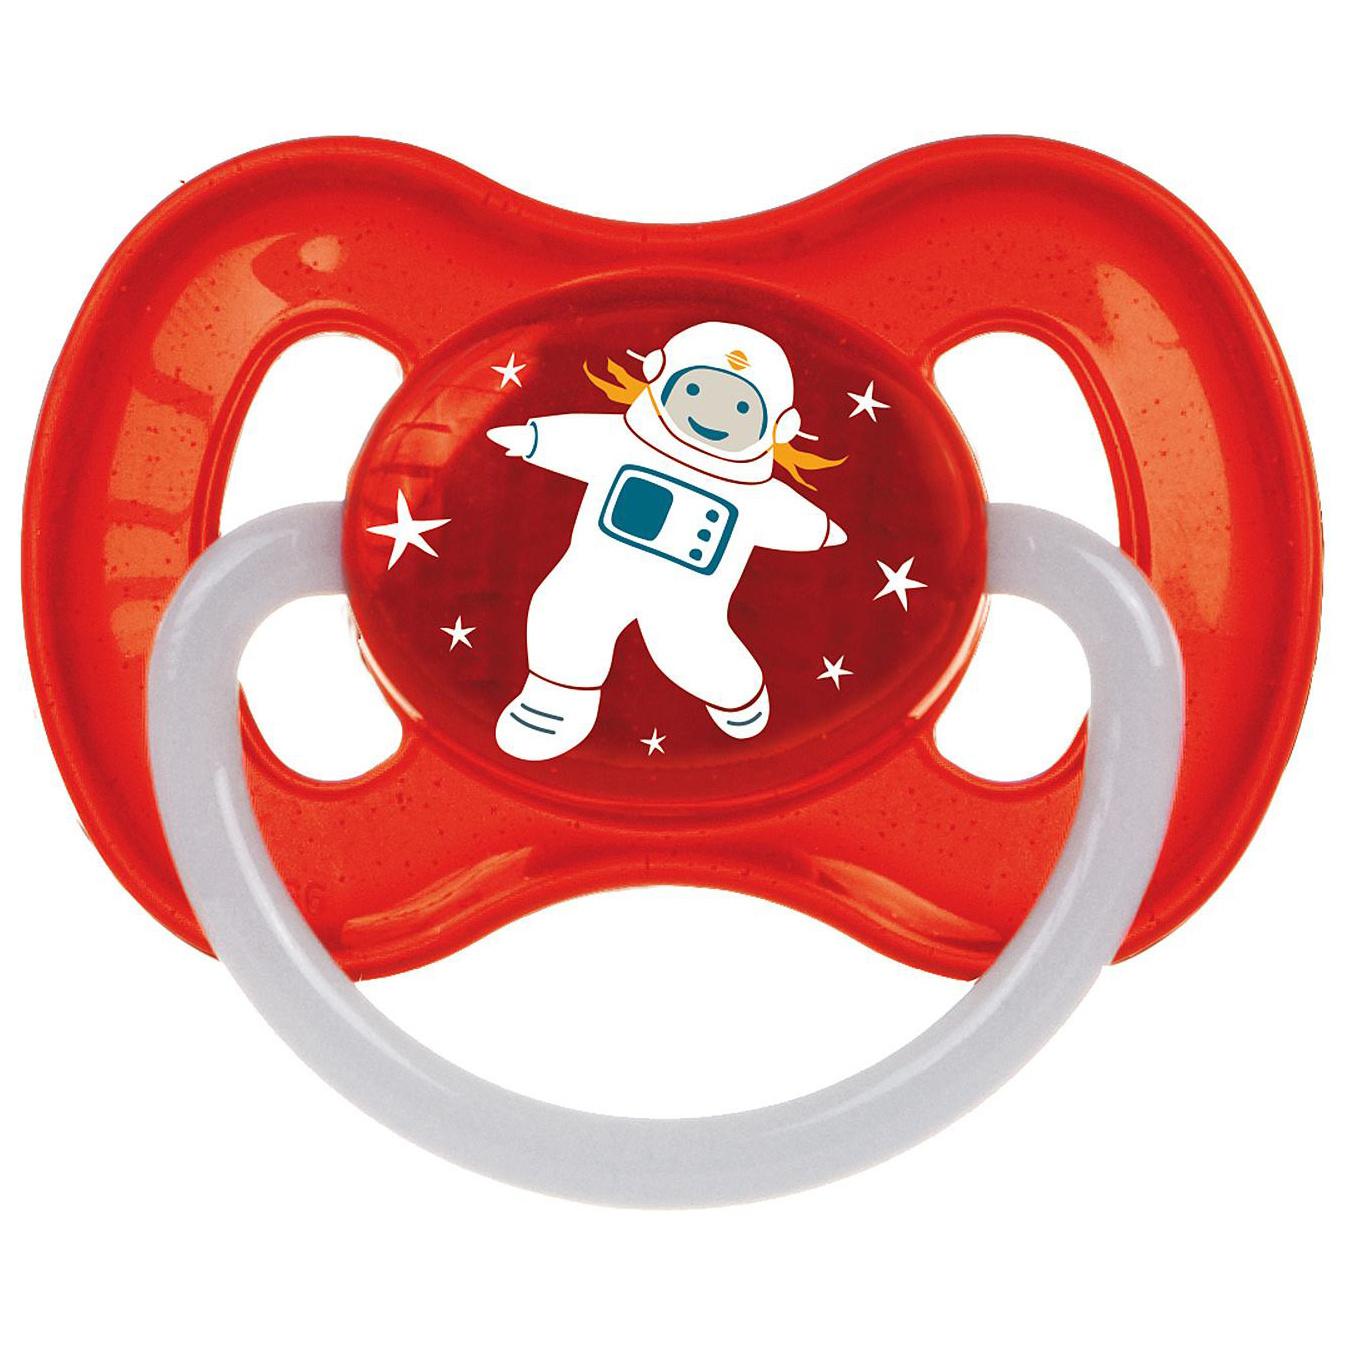 Пустышка латексная Canpol Babies Space 6-18 мес 23/222/Красный